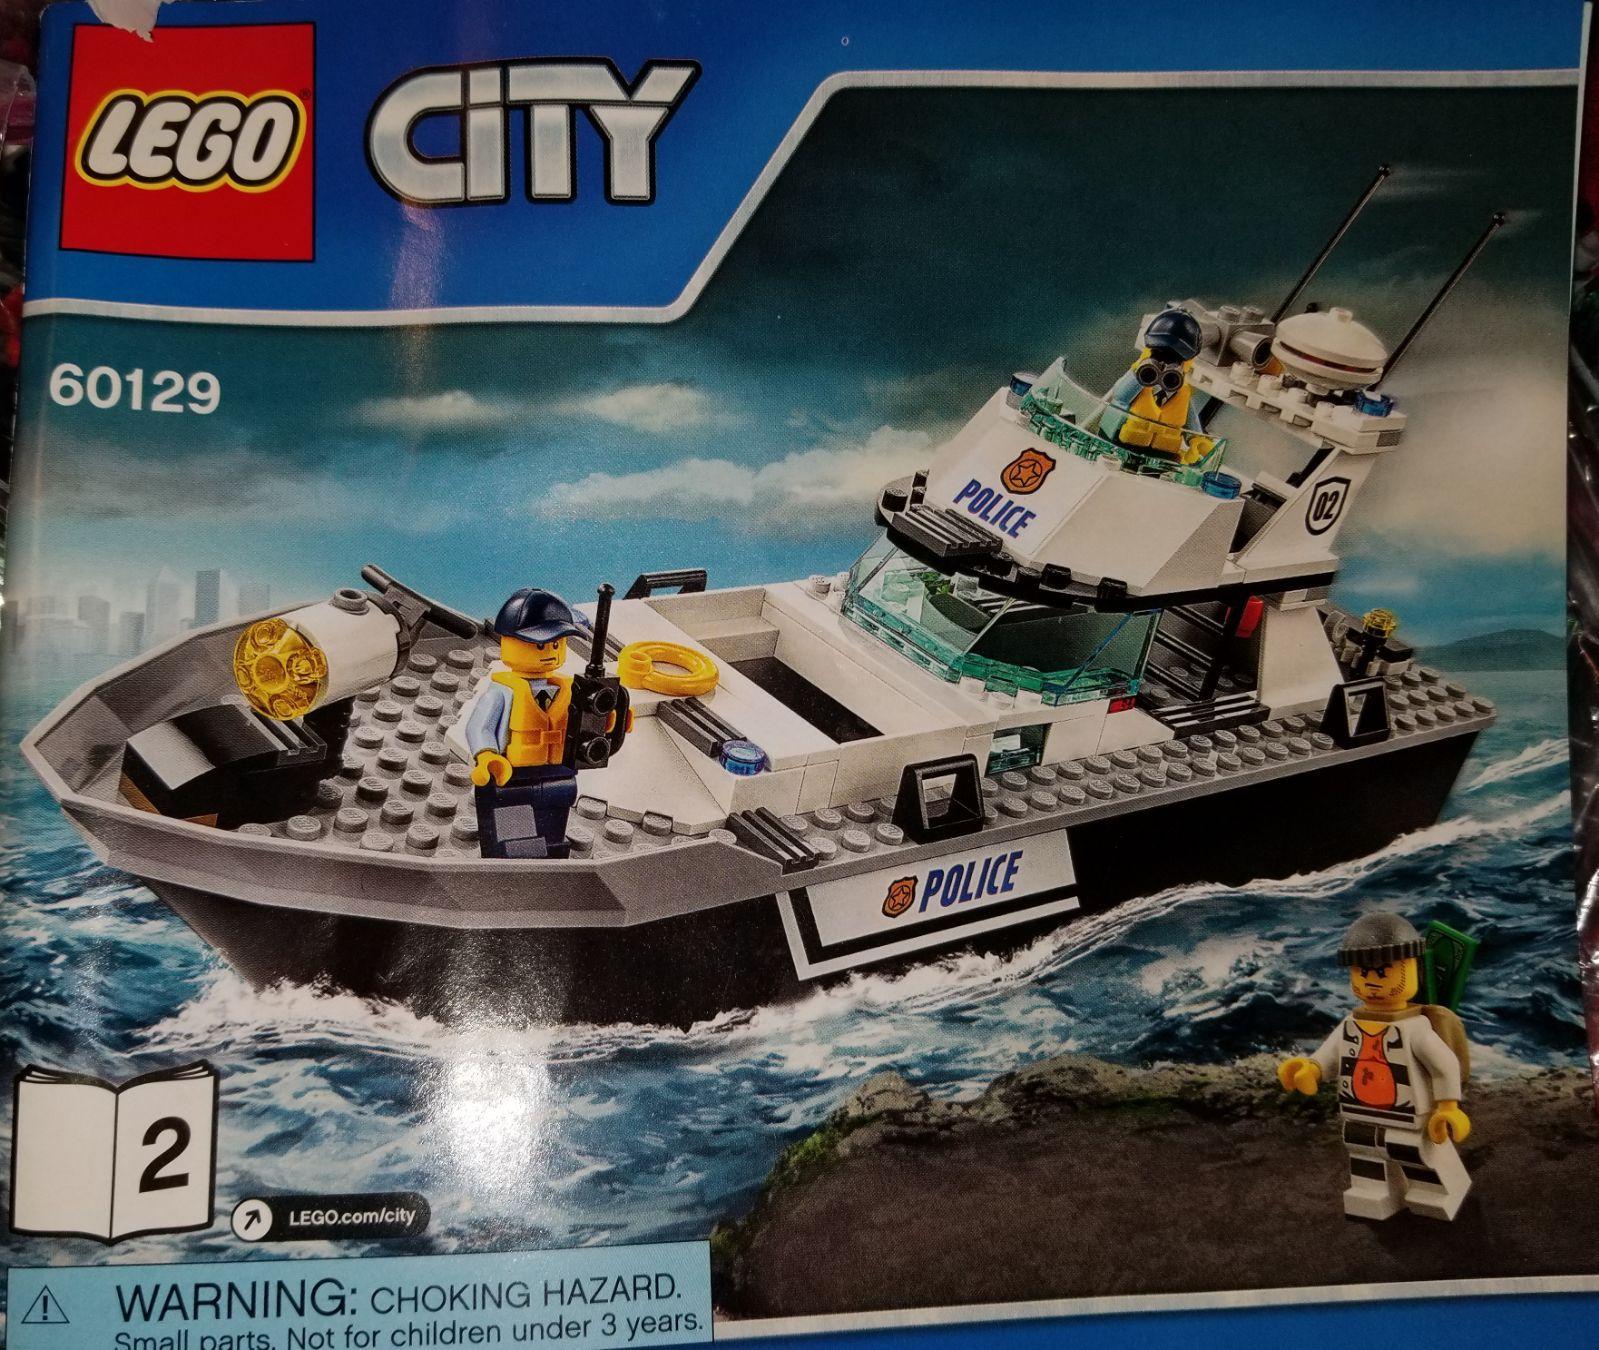 Lego City Police 60129 Police Patrol Boat Lego City Police Patrol Lego City Police